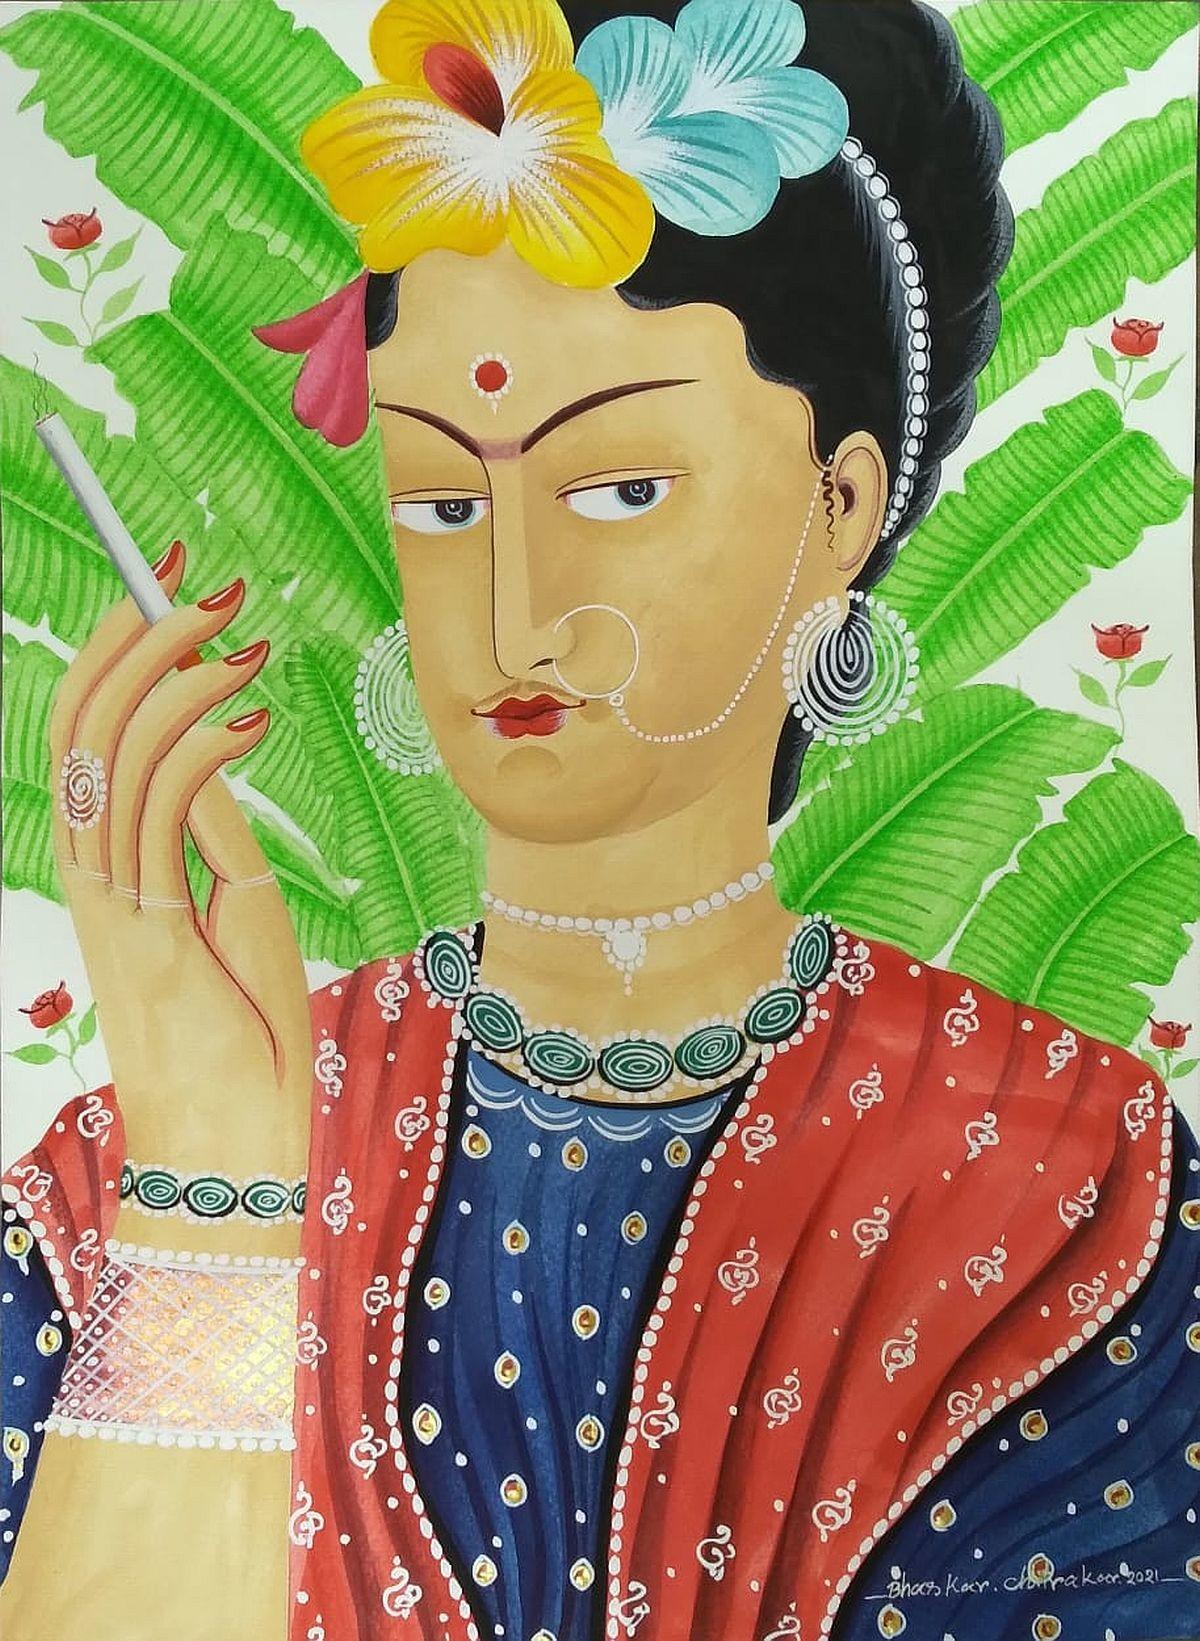 Kali-Kahlo with cigarette by Bhaskar Chitrakar, Folk Painting, Natural colours on paper, Olive color